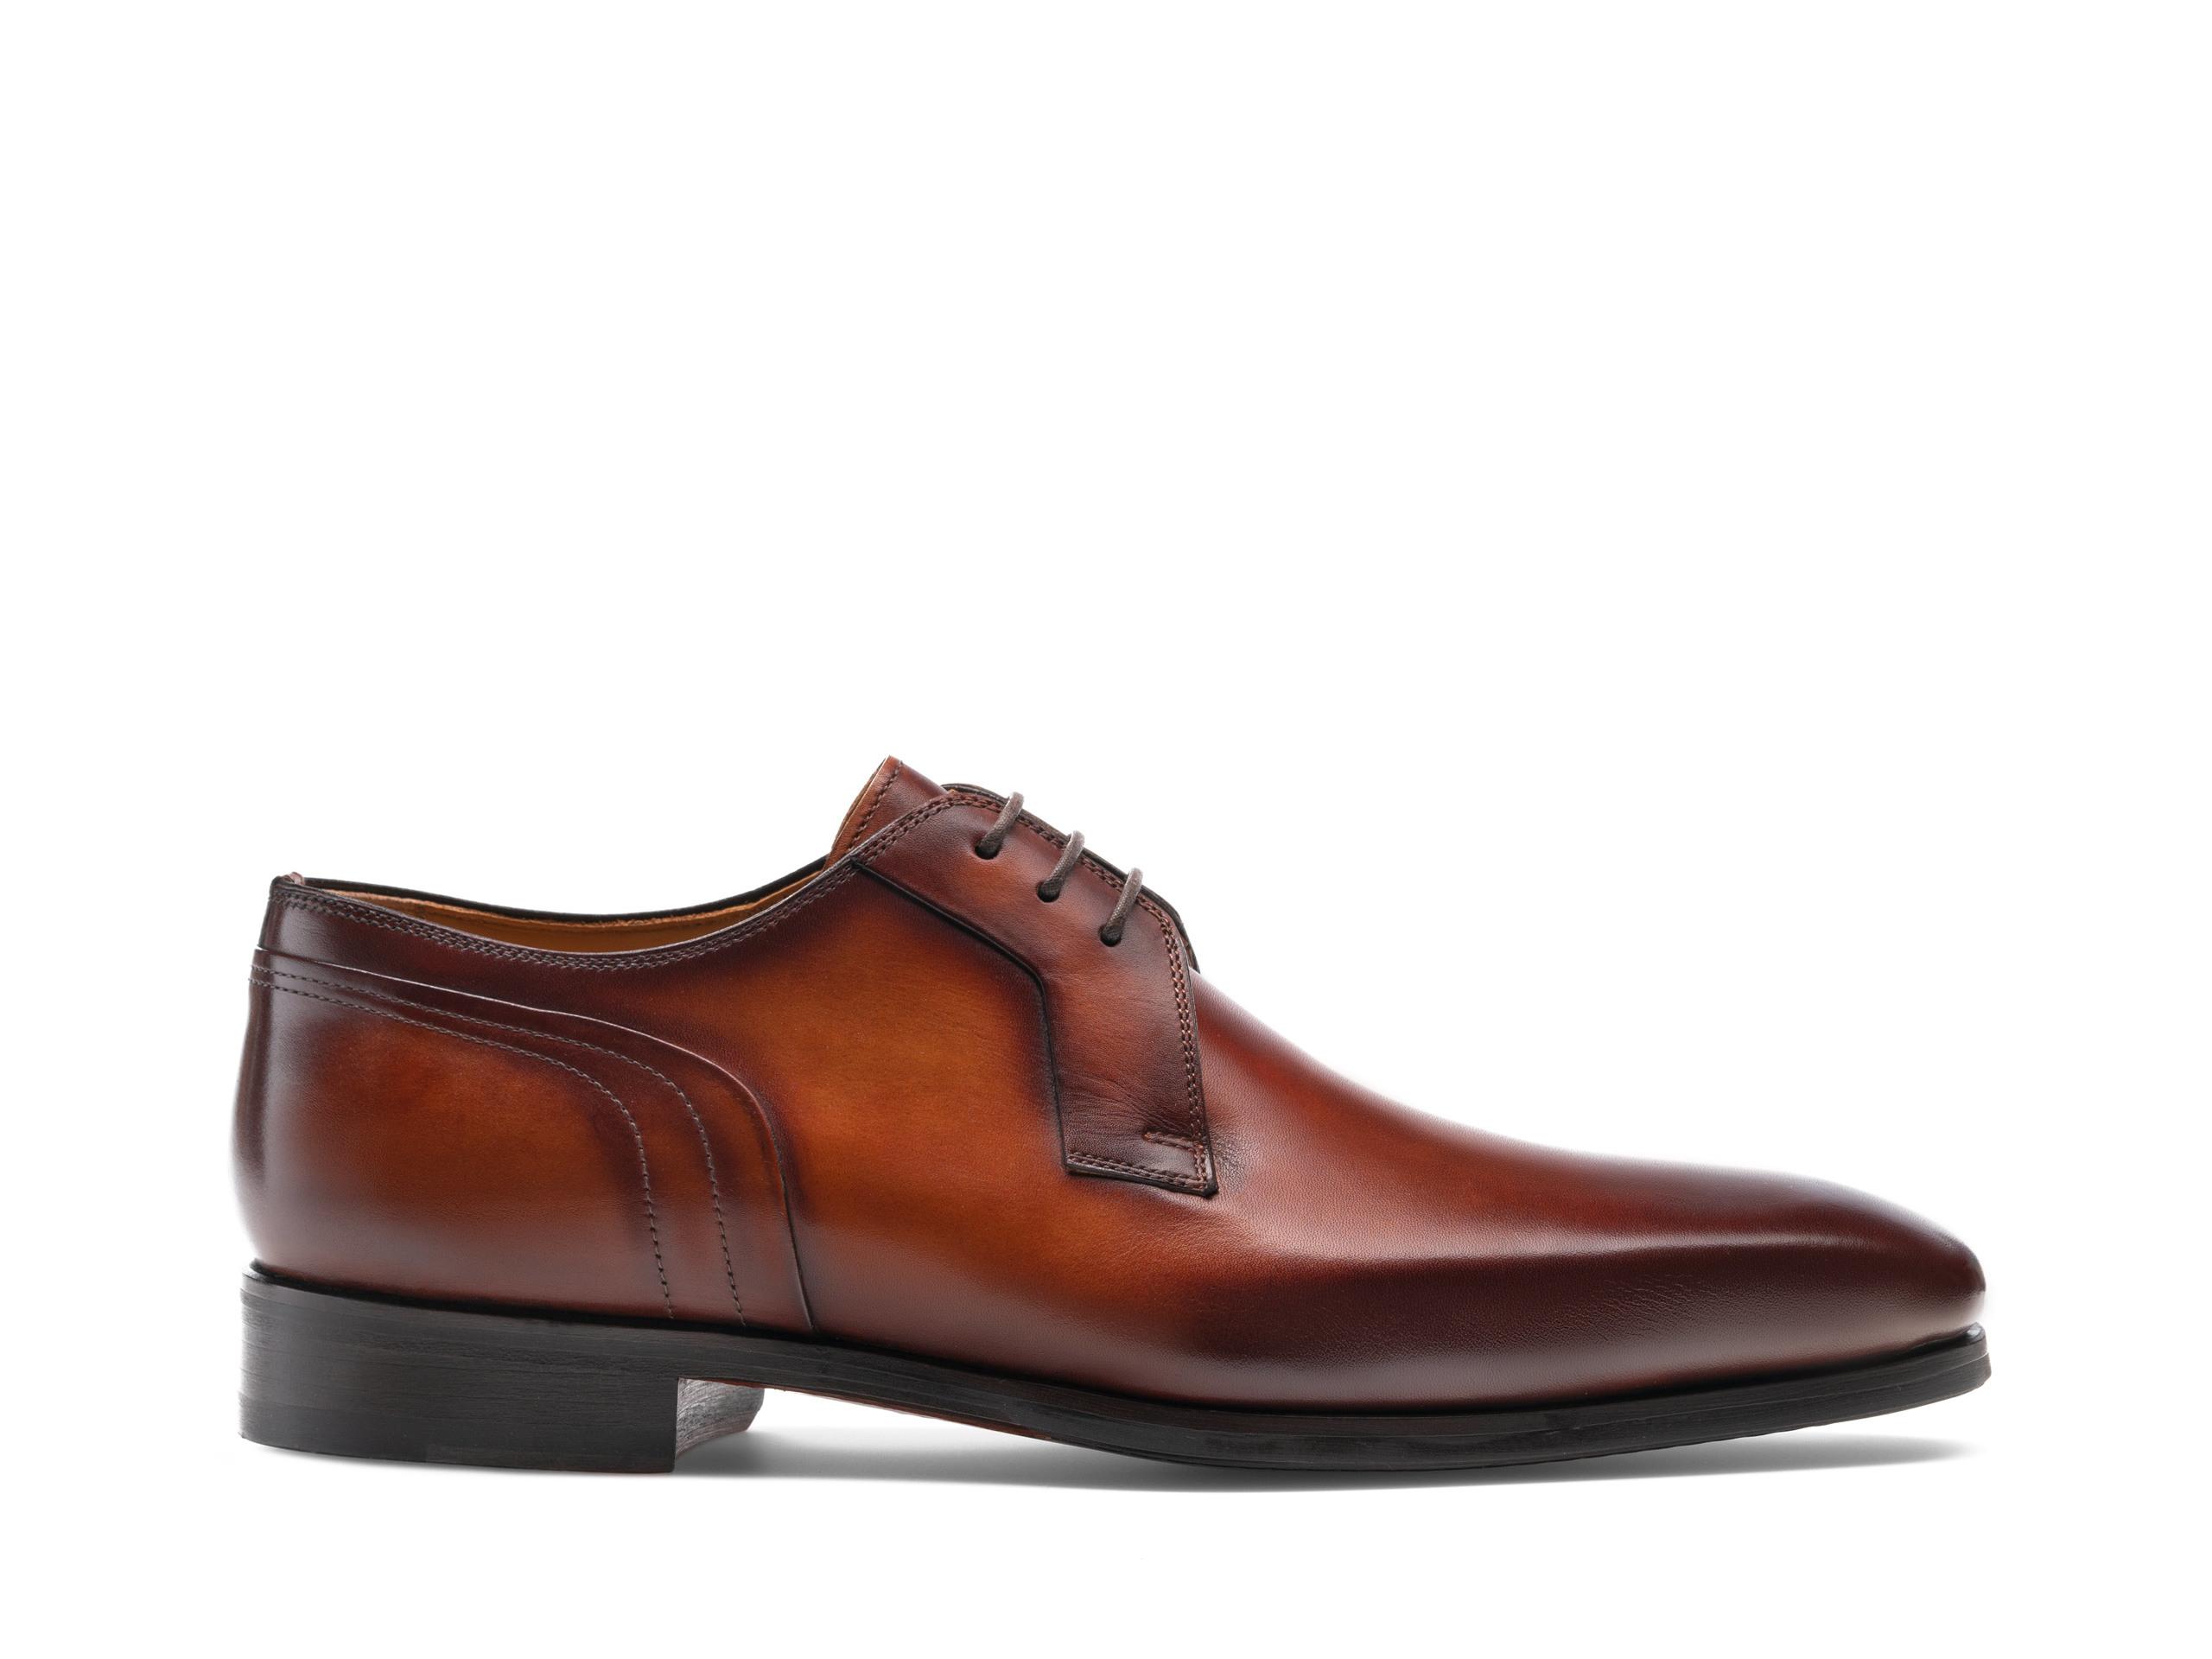 Magnanni Justino Cognac Shoes